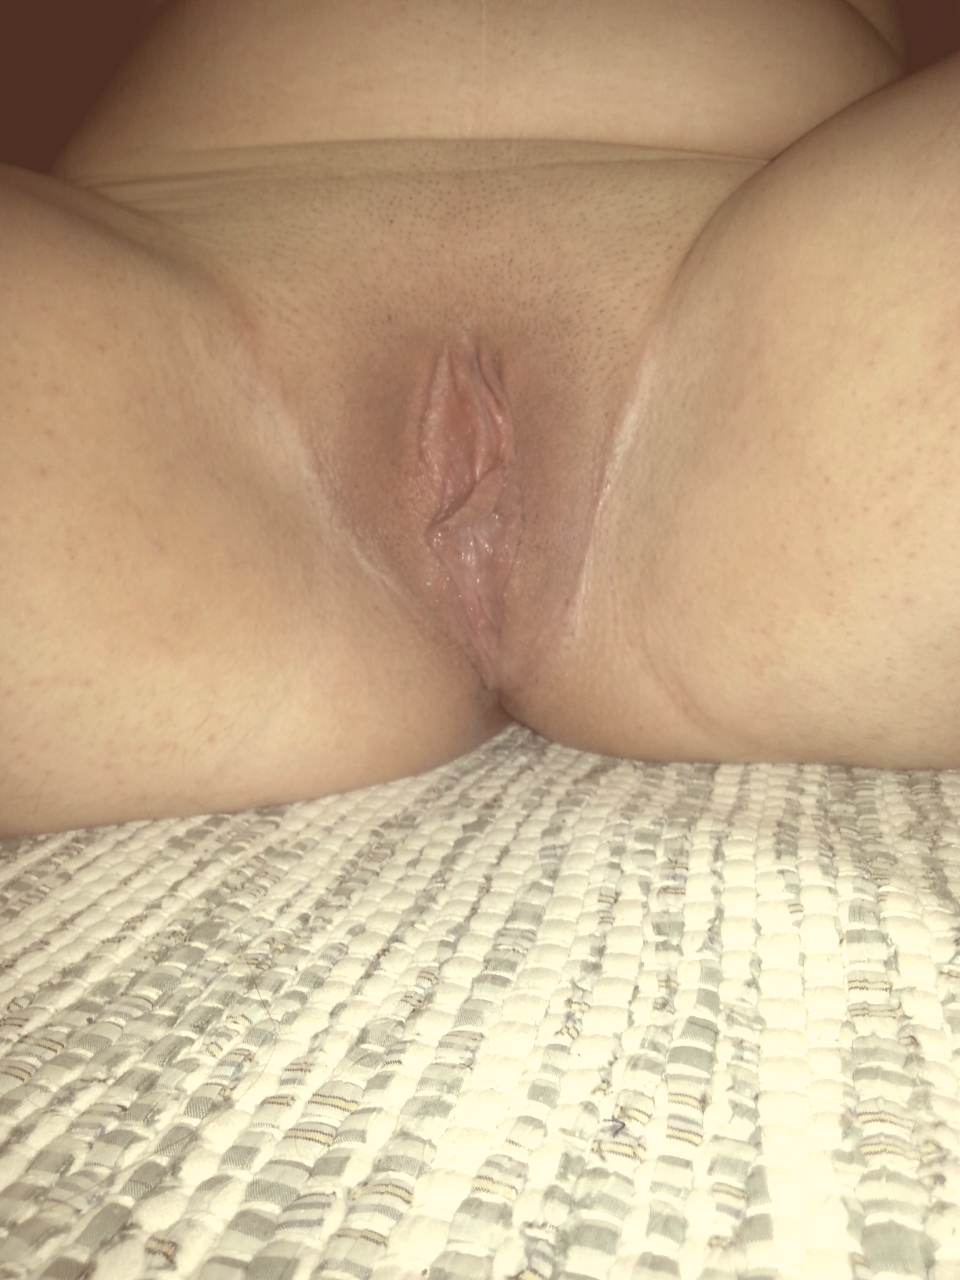 pindurka97 - eroticmassage